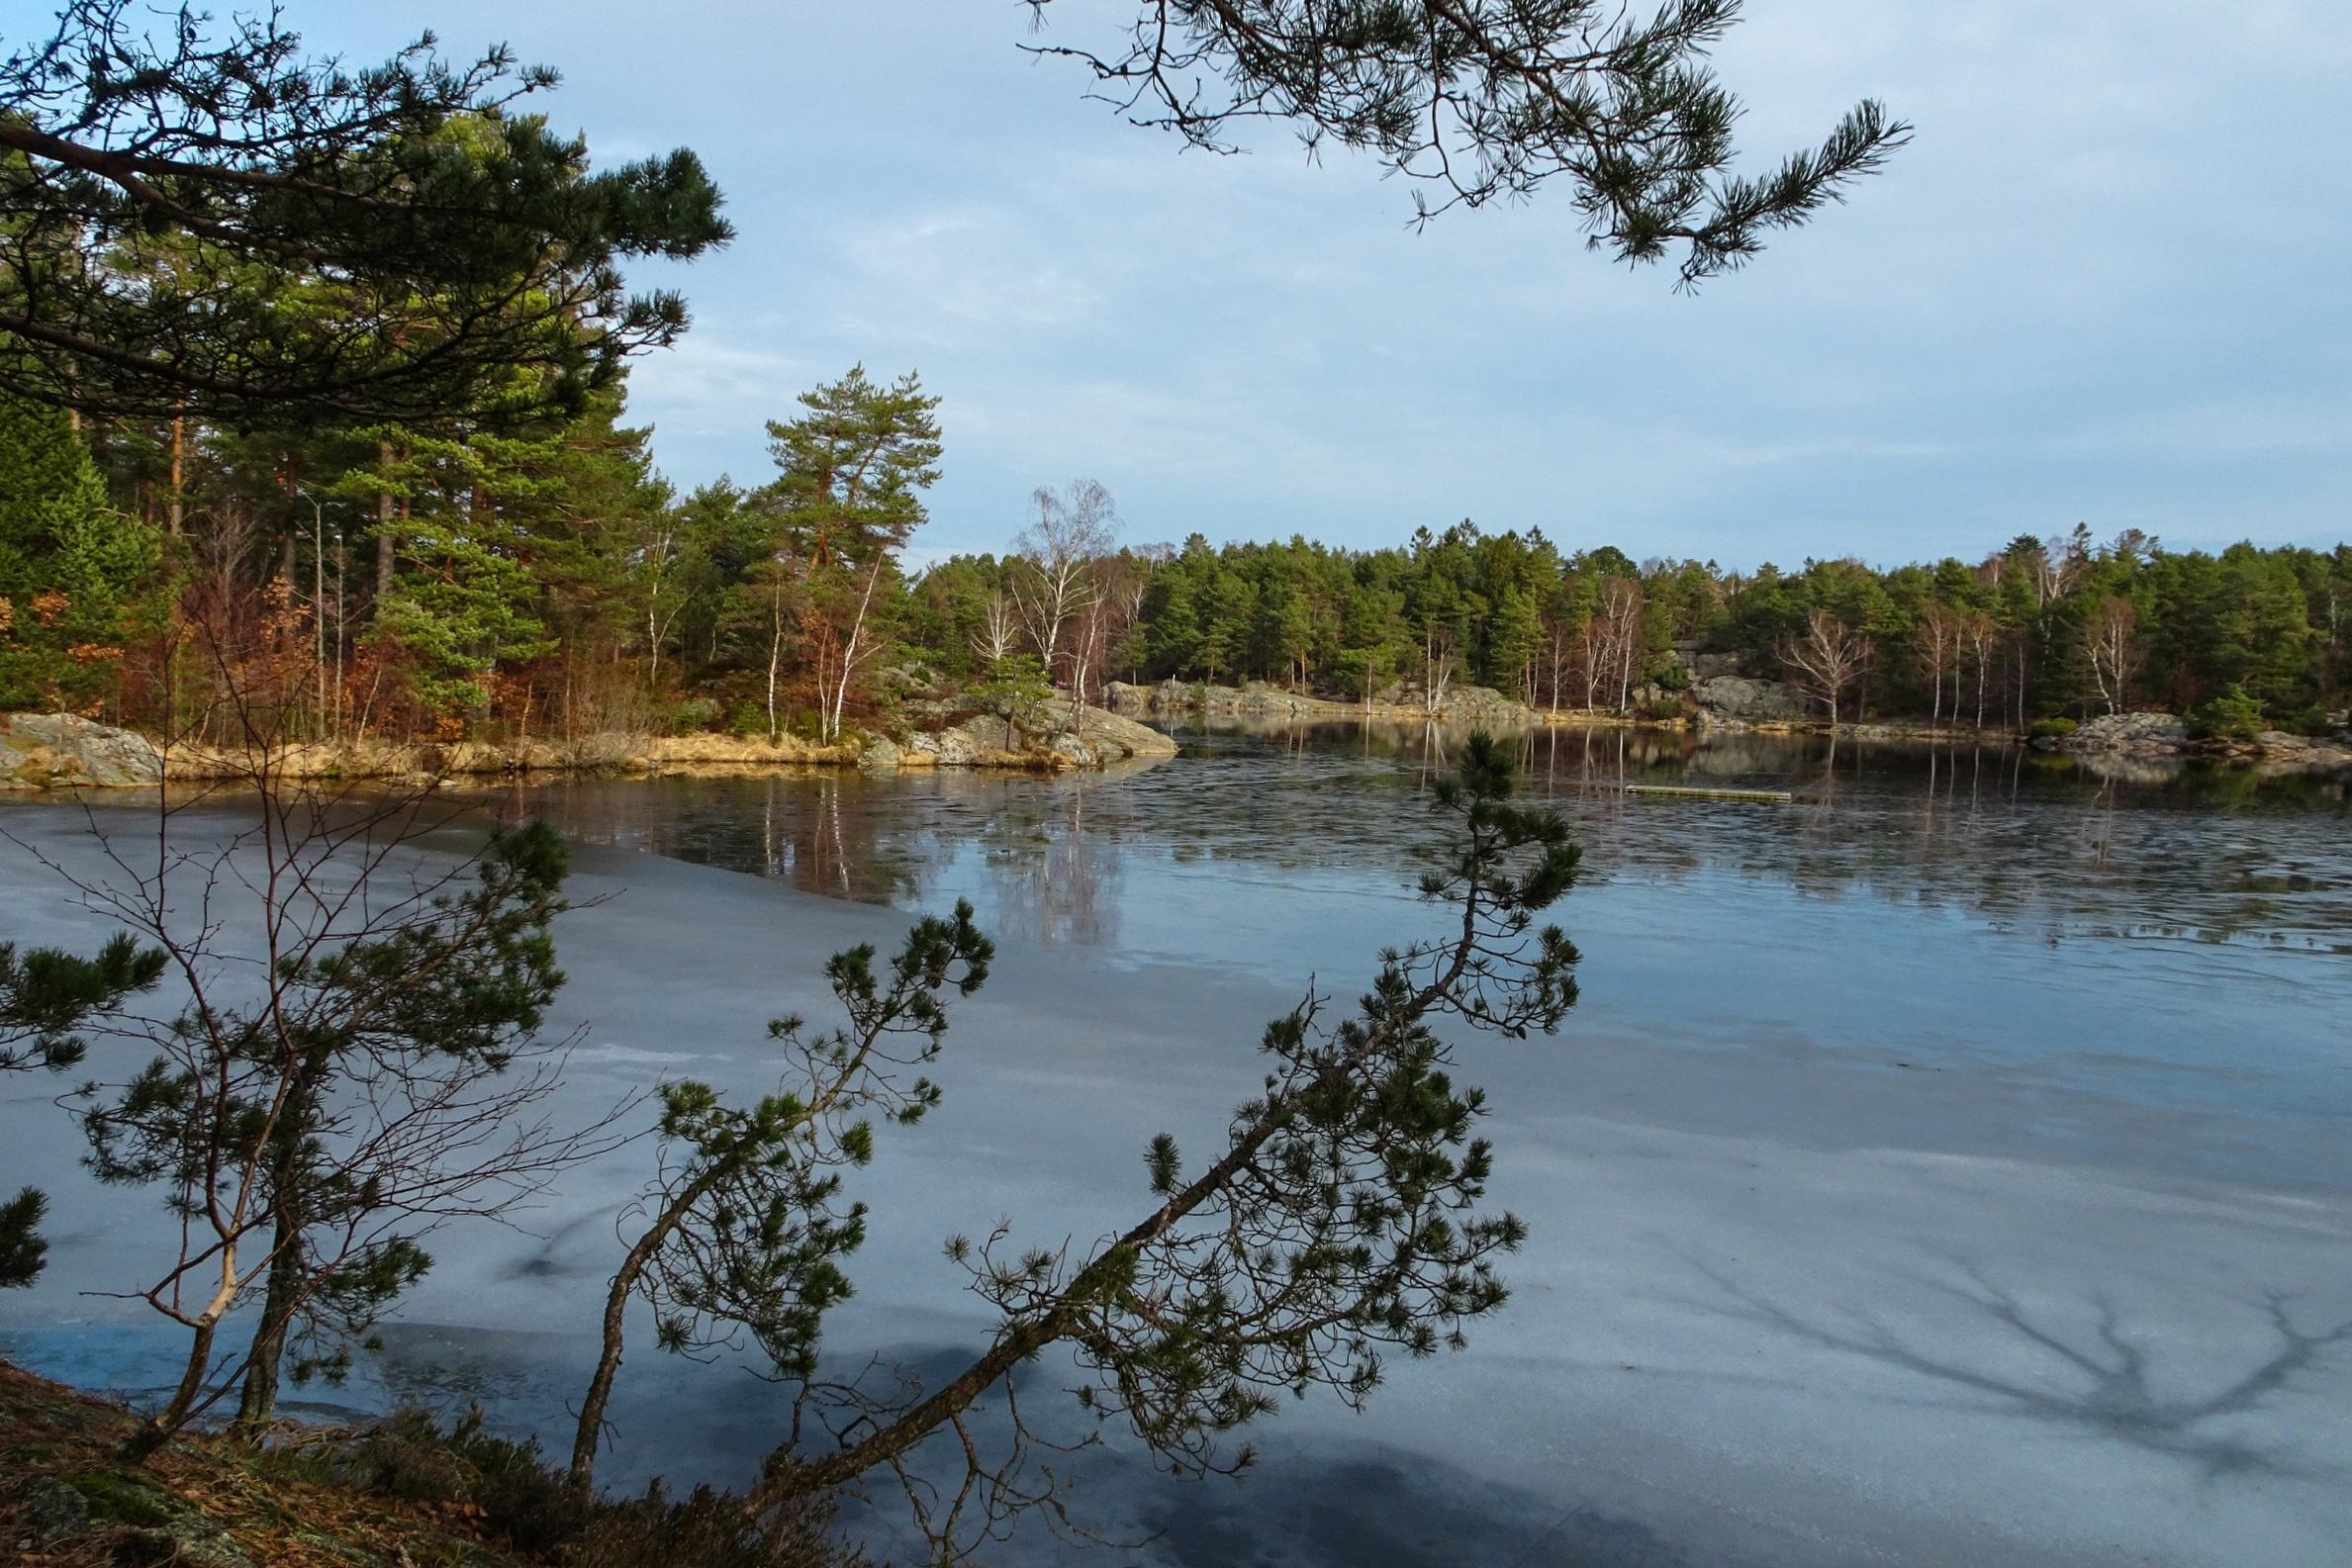 Baneheia, Kristiansand